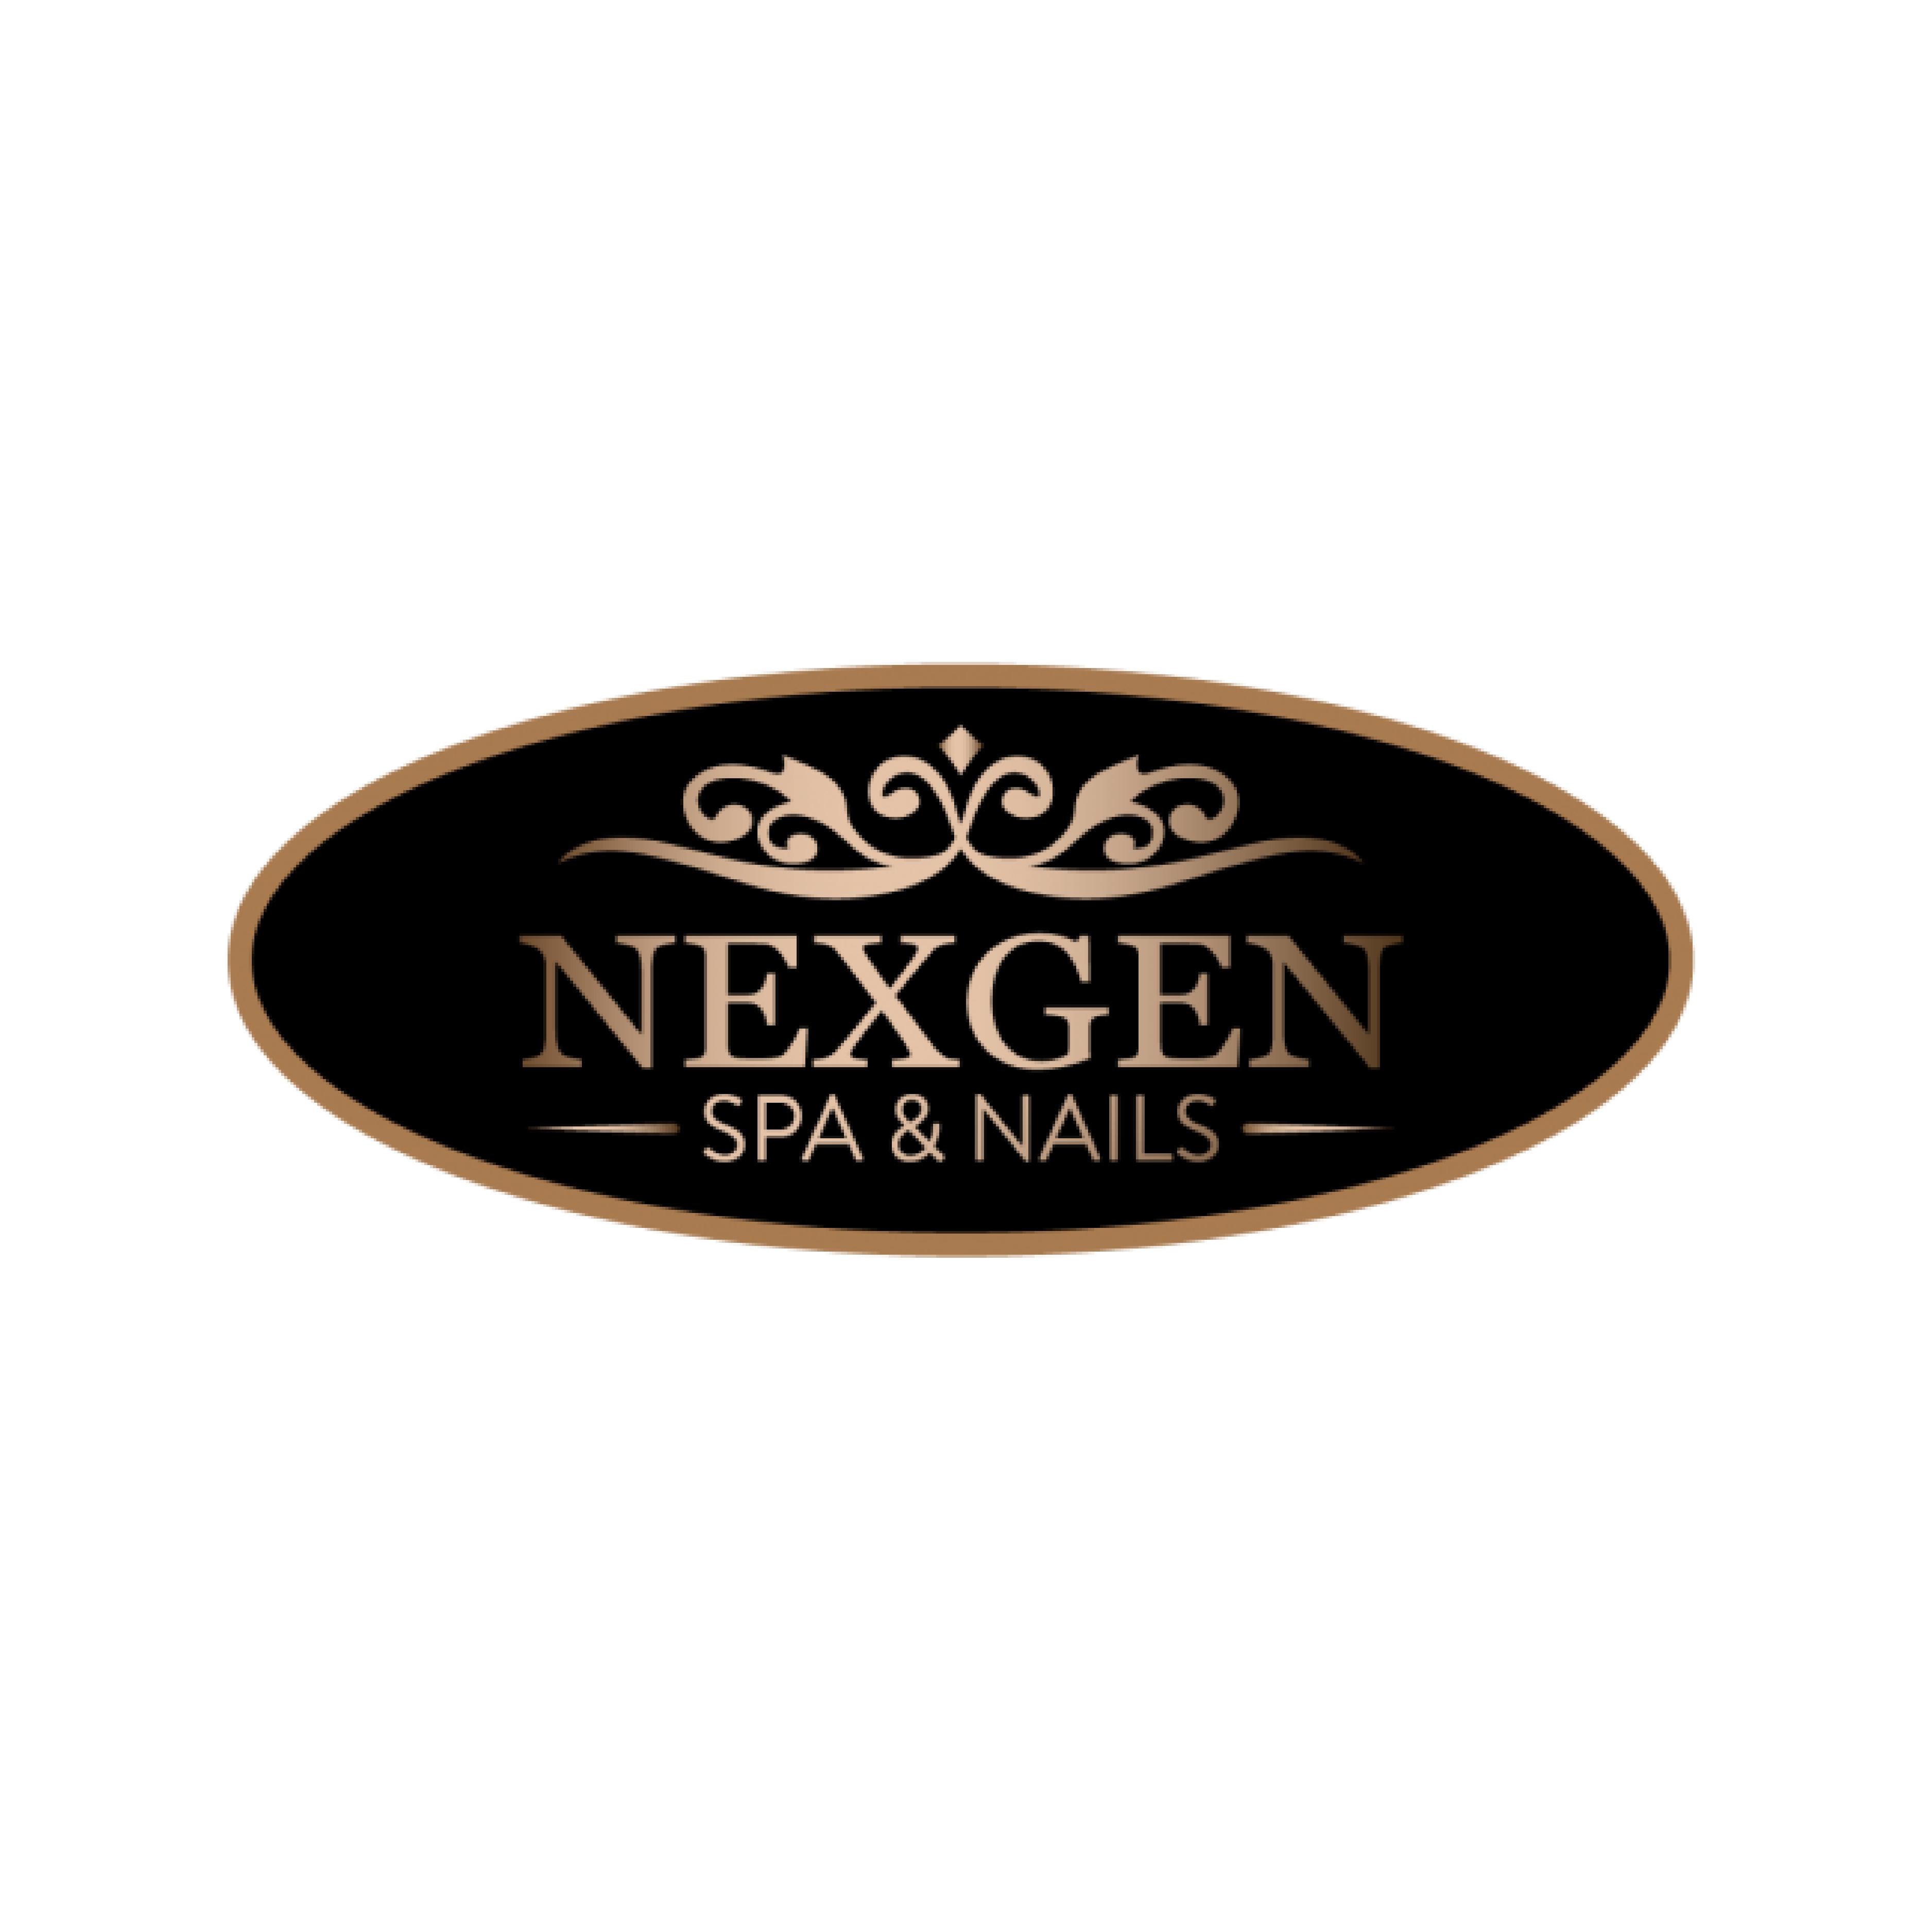 NEXGEN SPA & NAILS